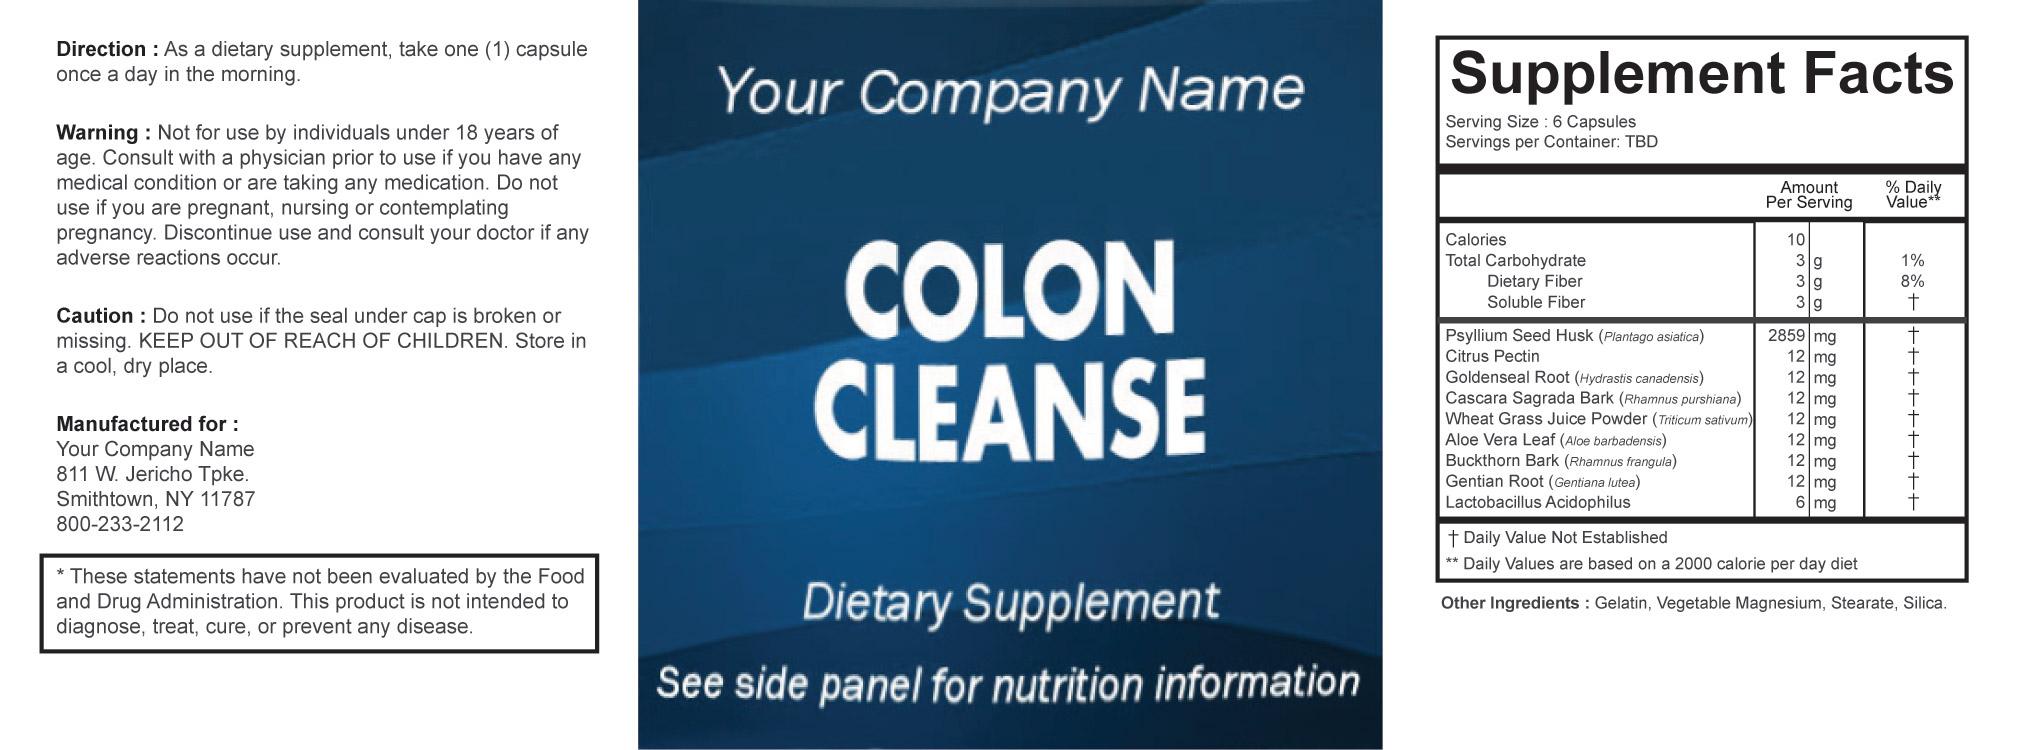 Colon Cleanse Pictures